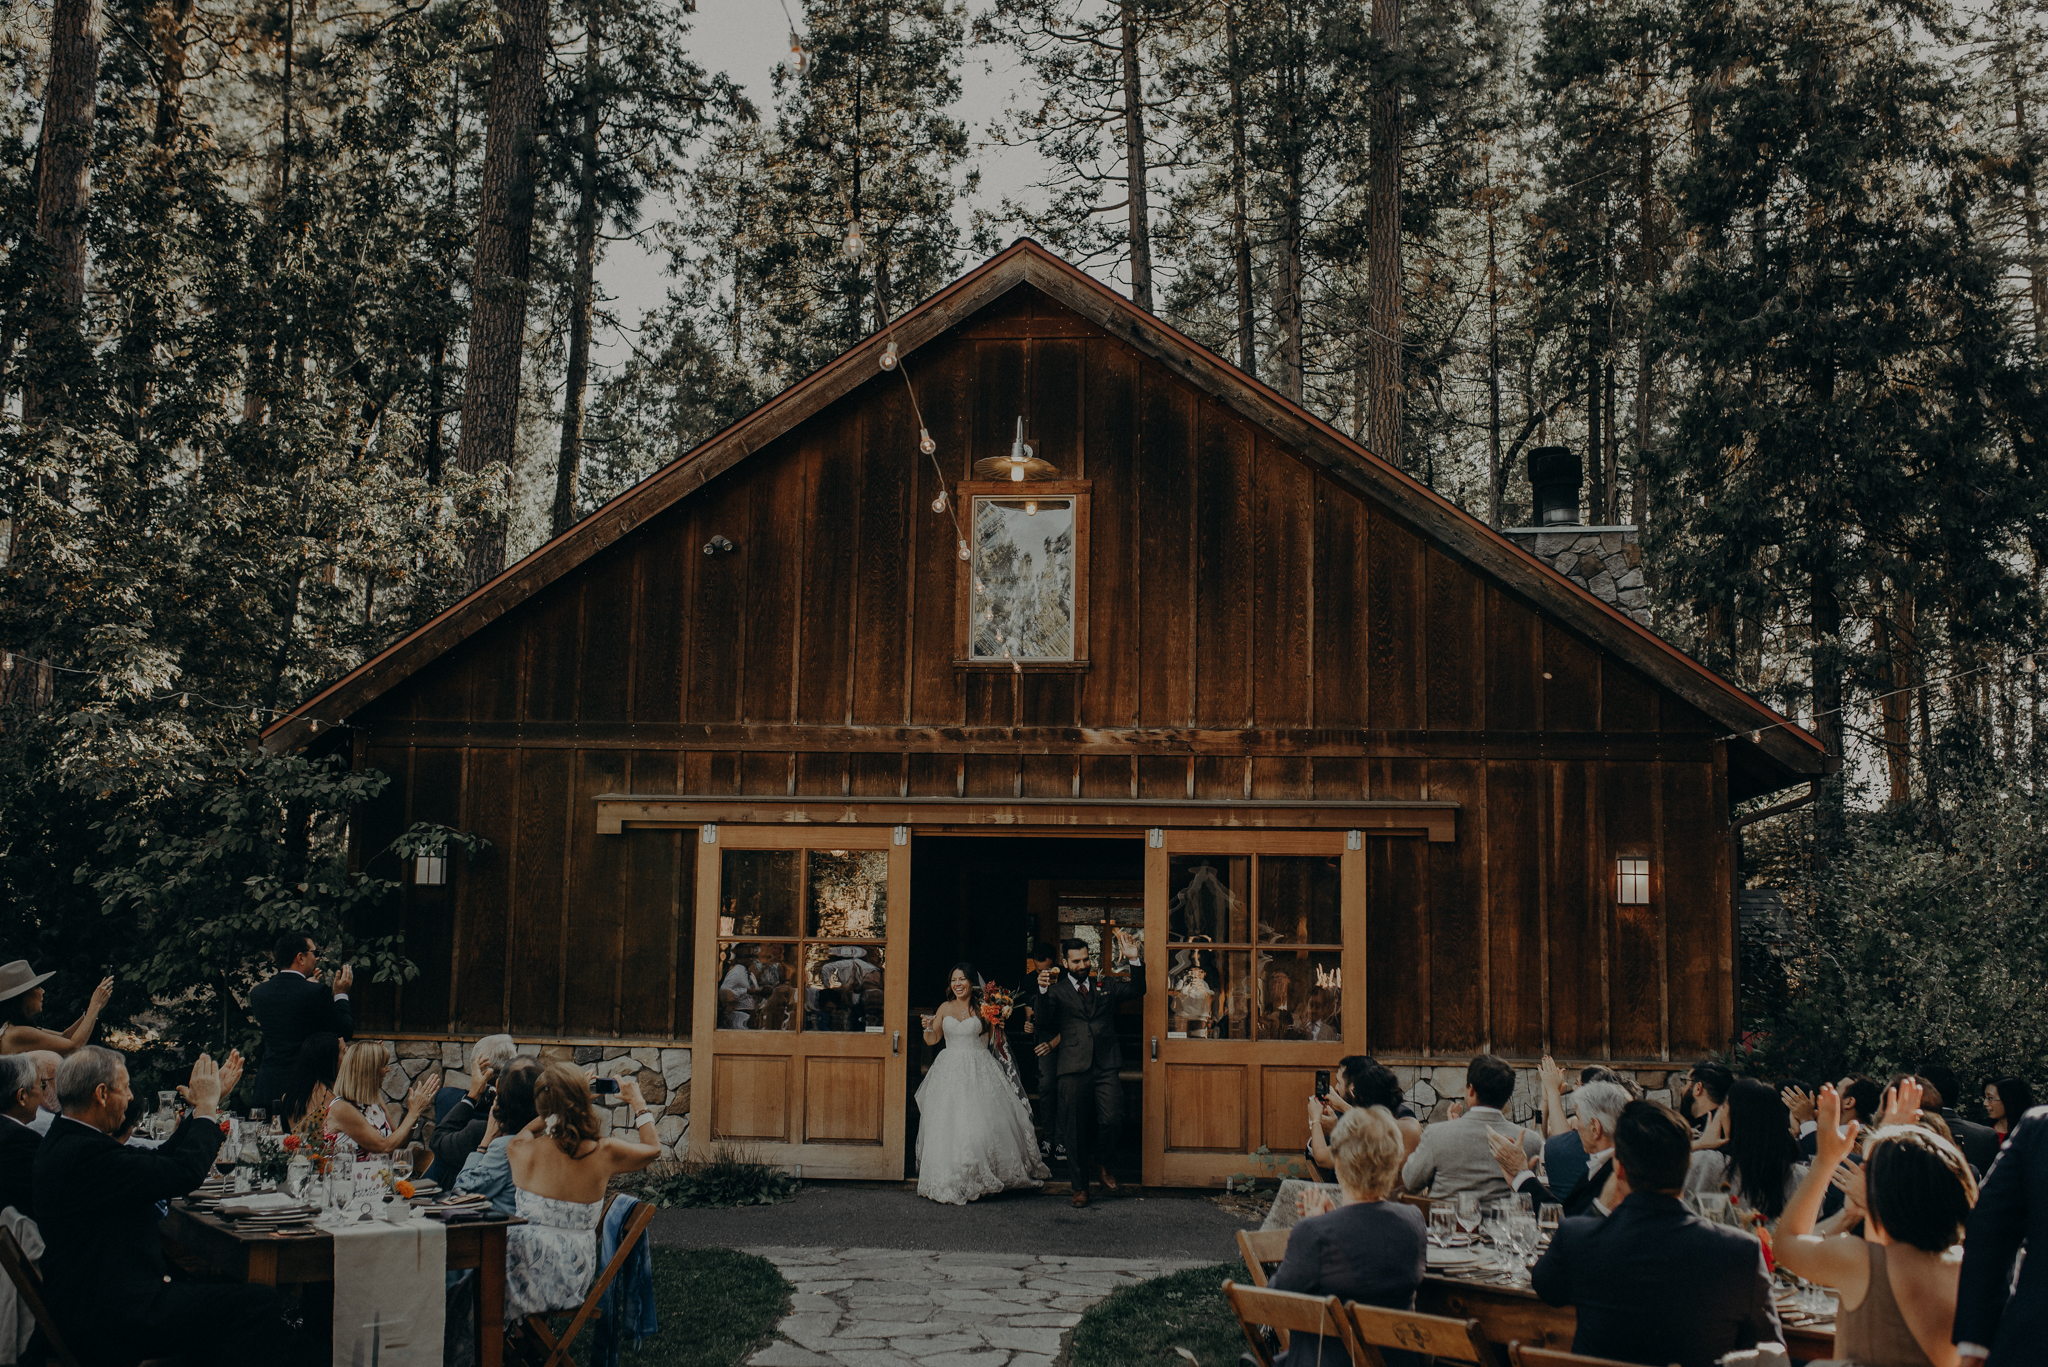 Yosemite Elopement Photographer - Evergreen Lodge Wedding Photographer - IsaiahAndTaylor.com-120.jpg